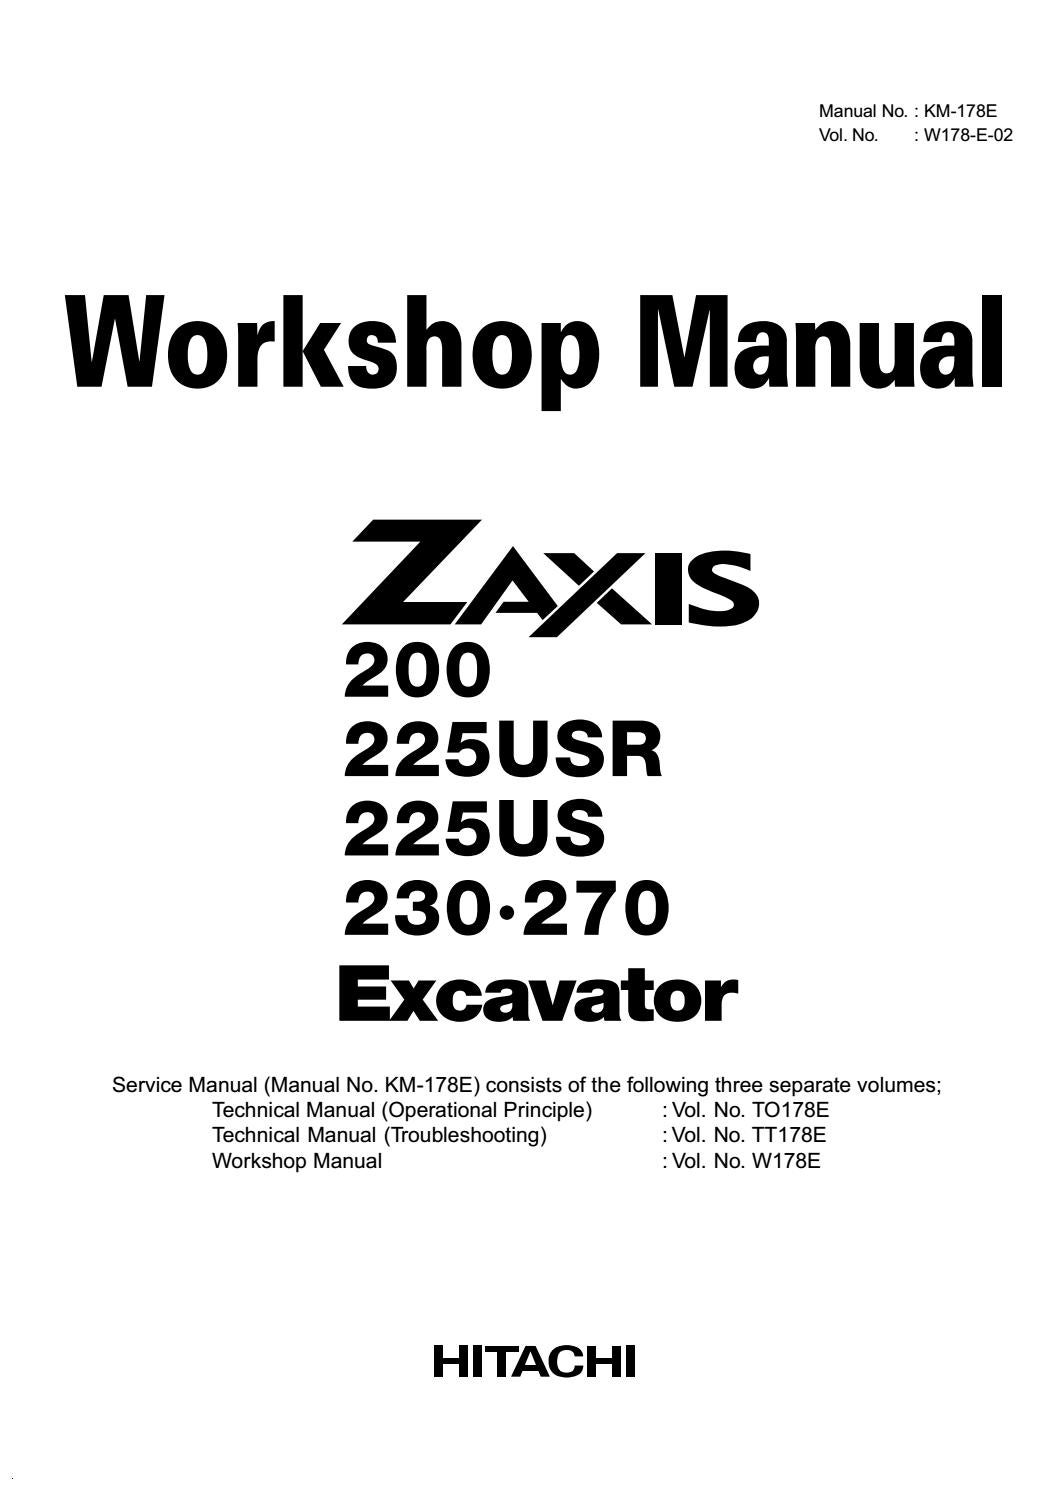 HITACHI ZAXIS 225USRLC EXCAVATOR Service Repair Manual by